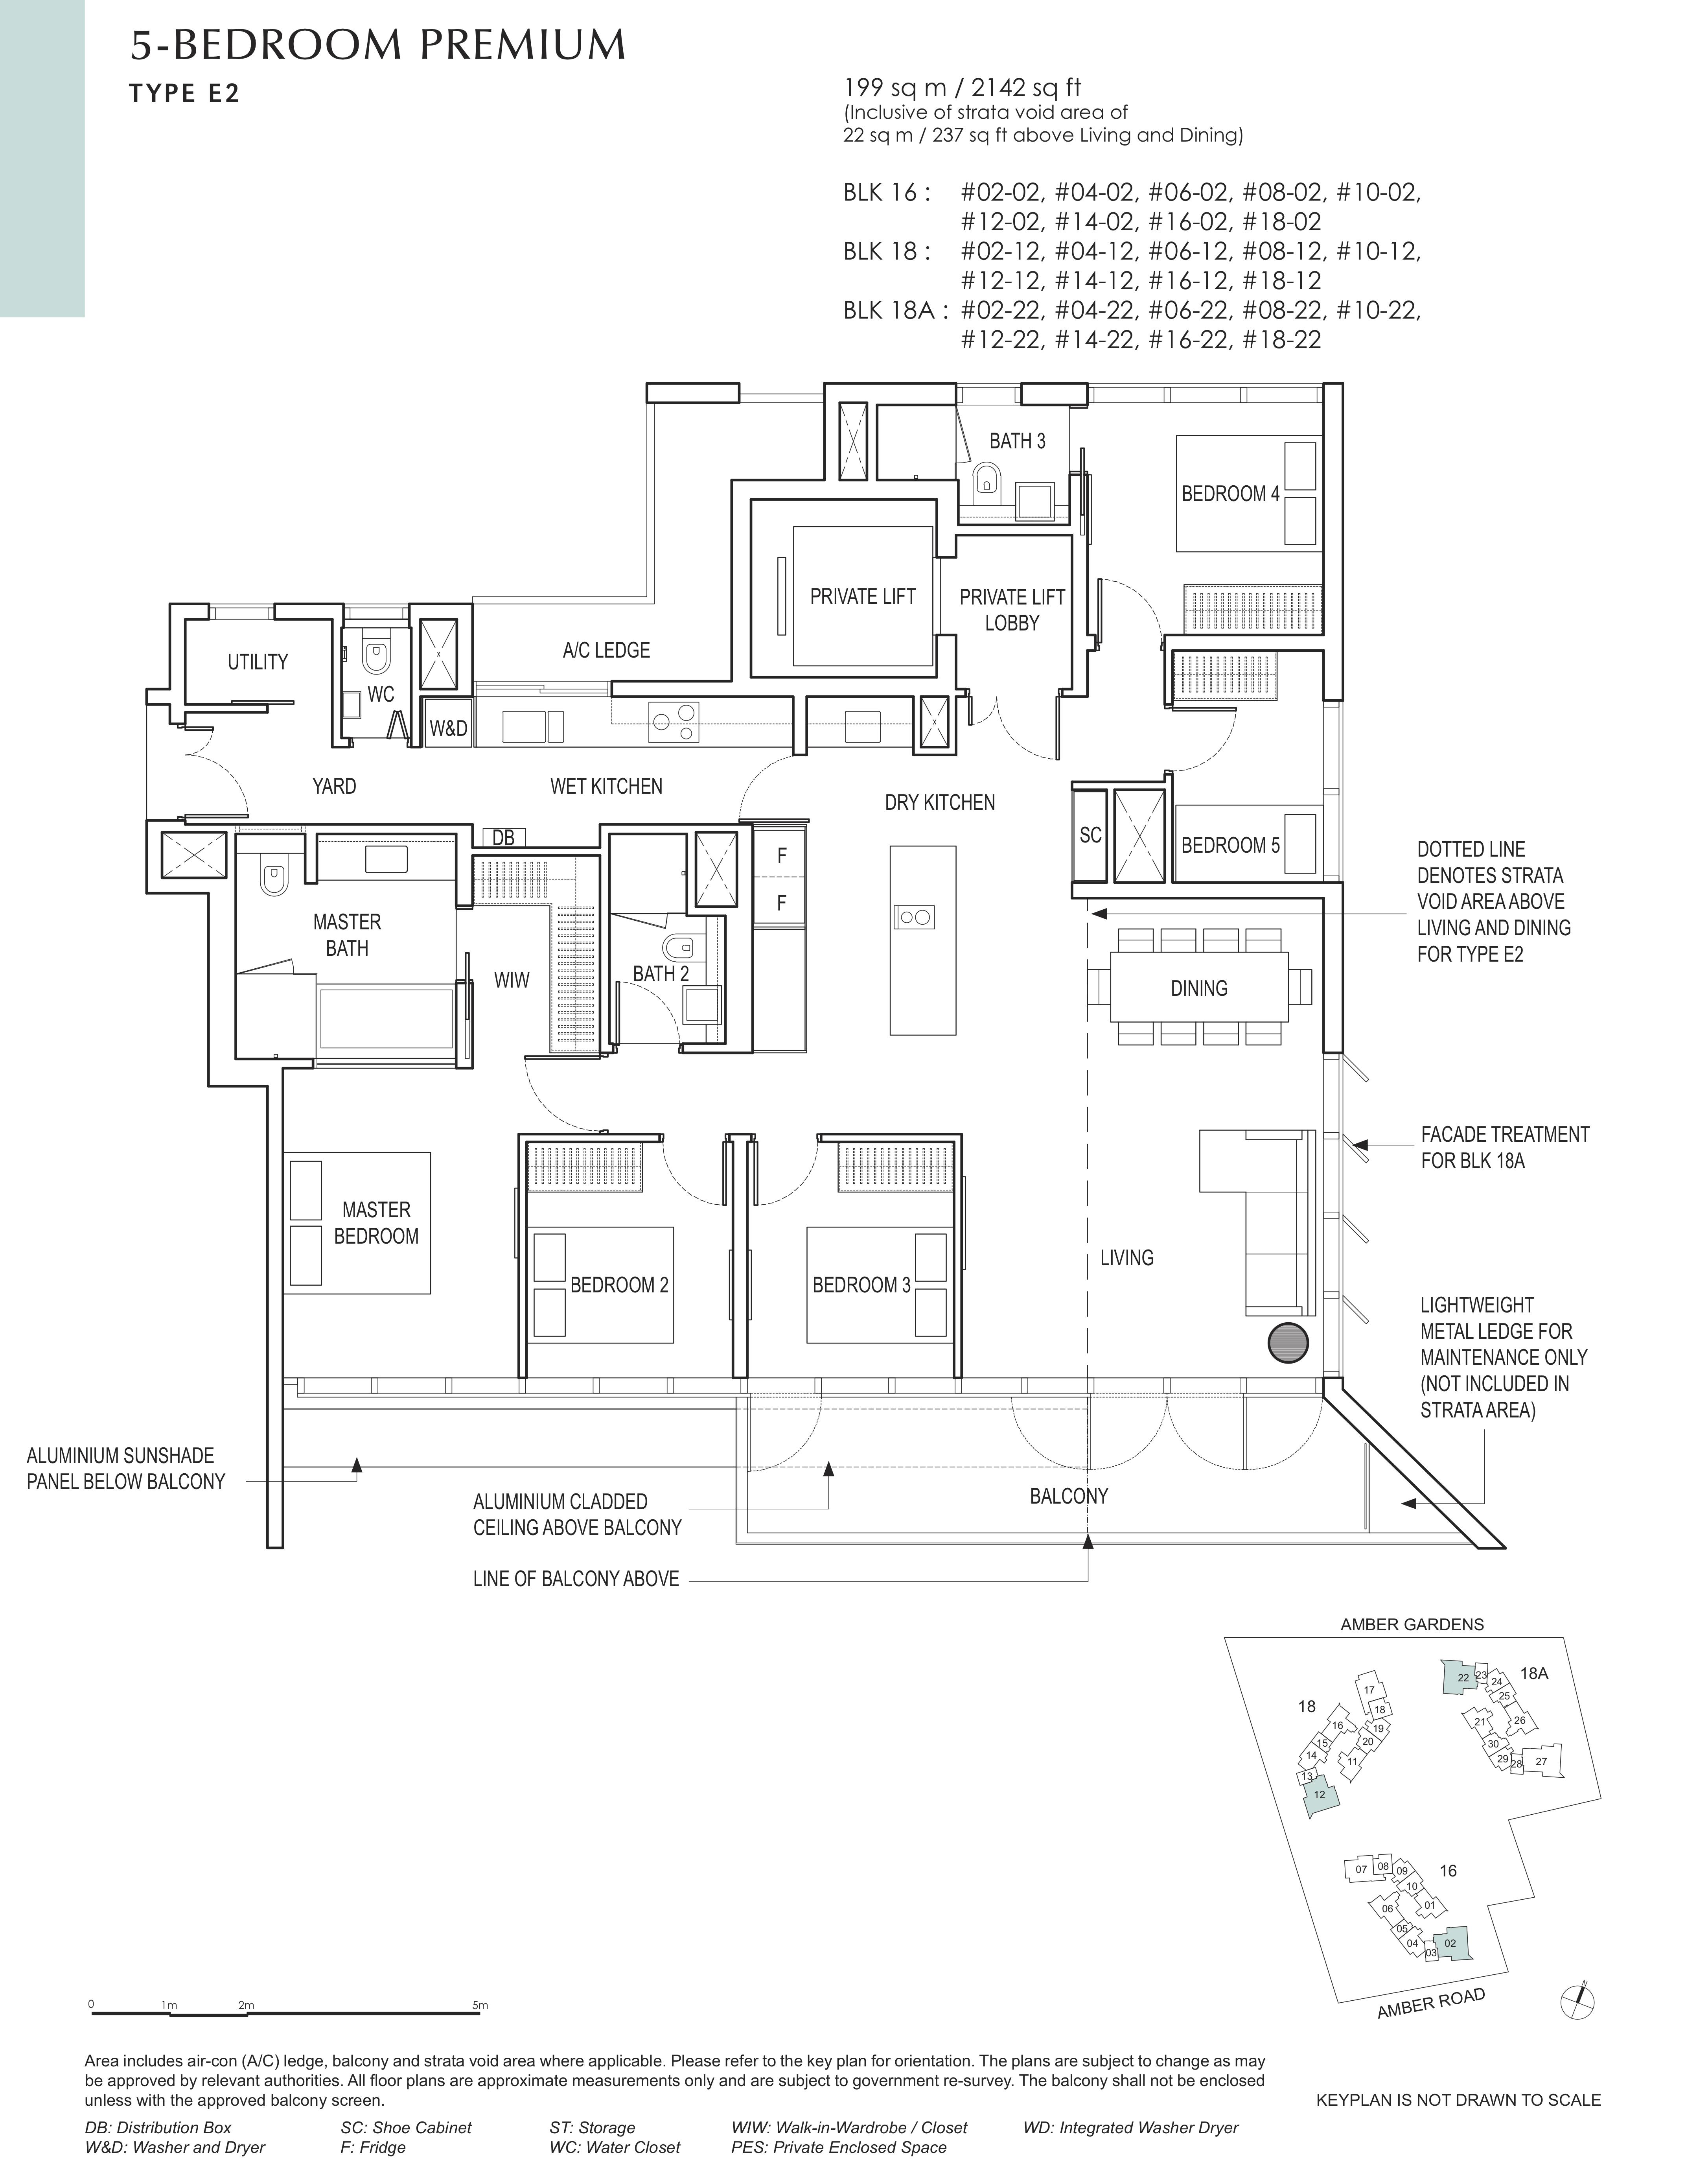 Amber Park 安铂苑 floor plan 5 bedroom premium 5卧房优质 e2